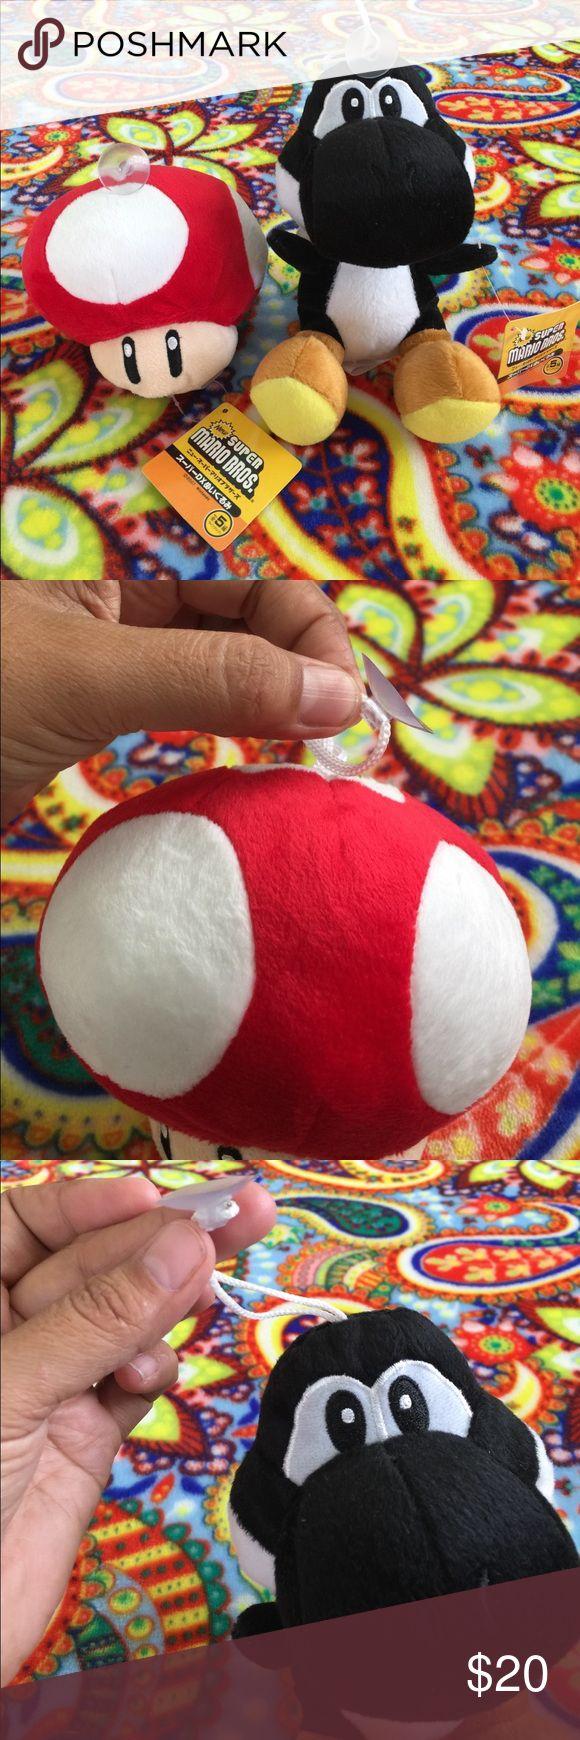 Nintendo Super Mario Bros Plush Toy LOT Yoshi NEW Boutique